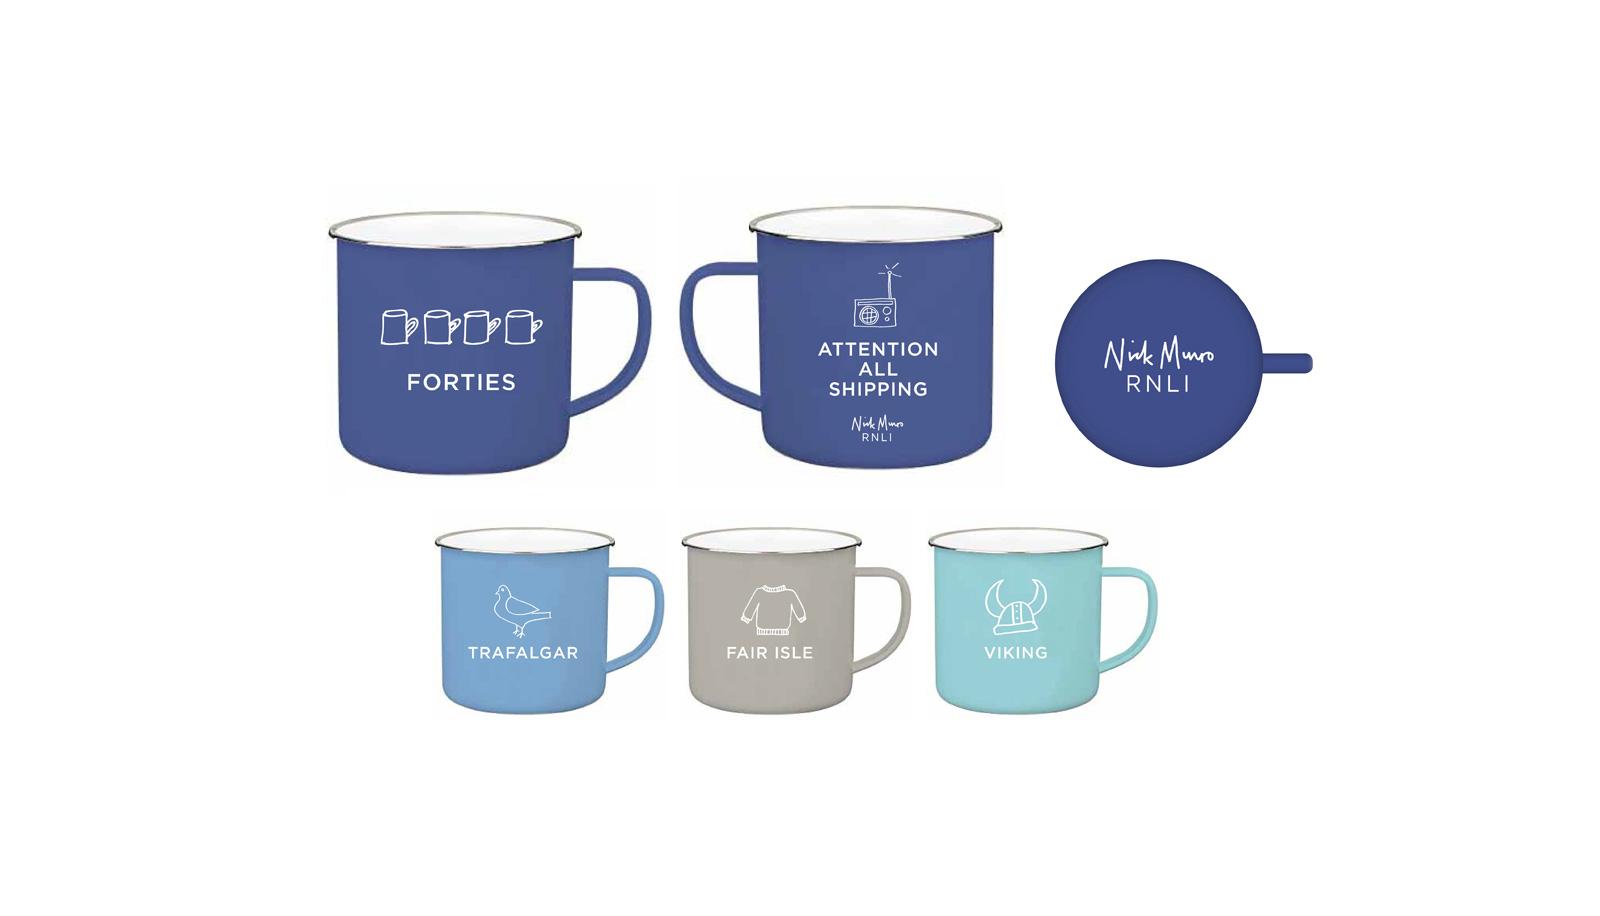 nm_rnli_mugs